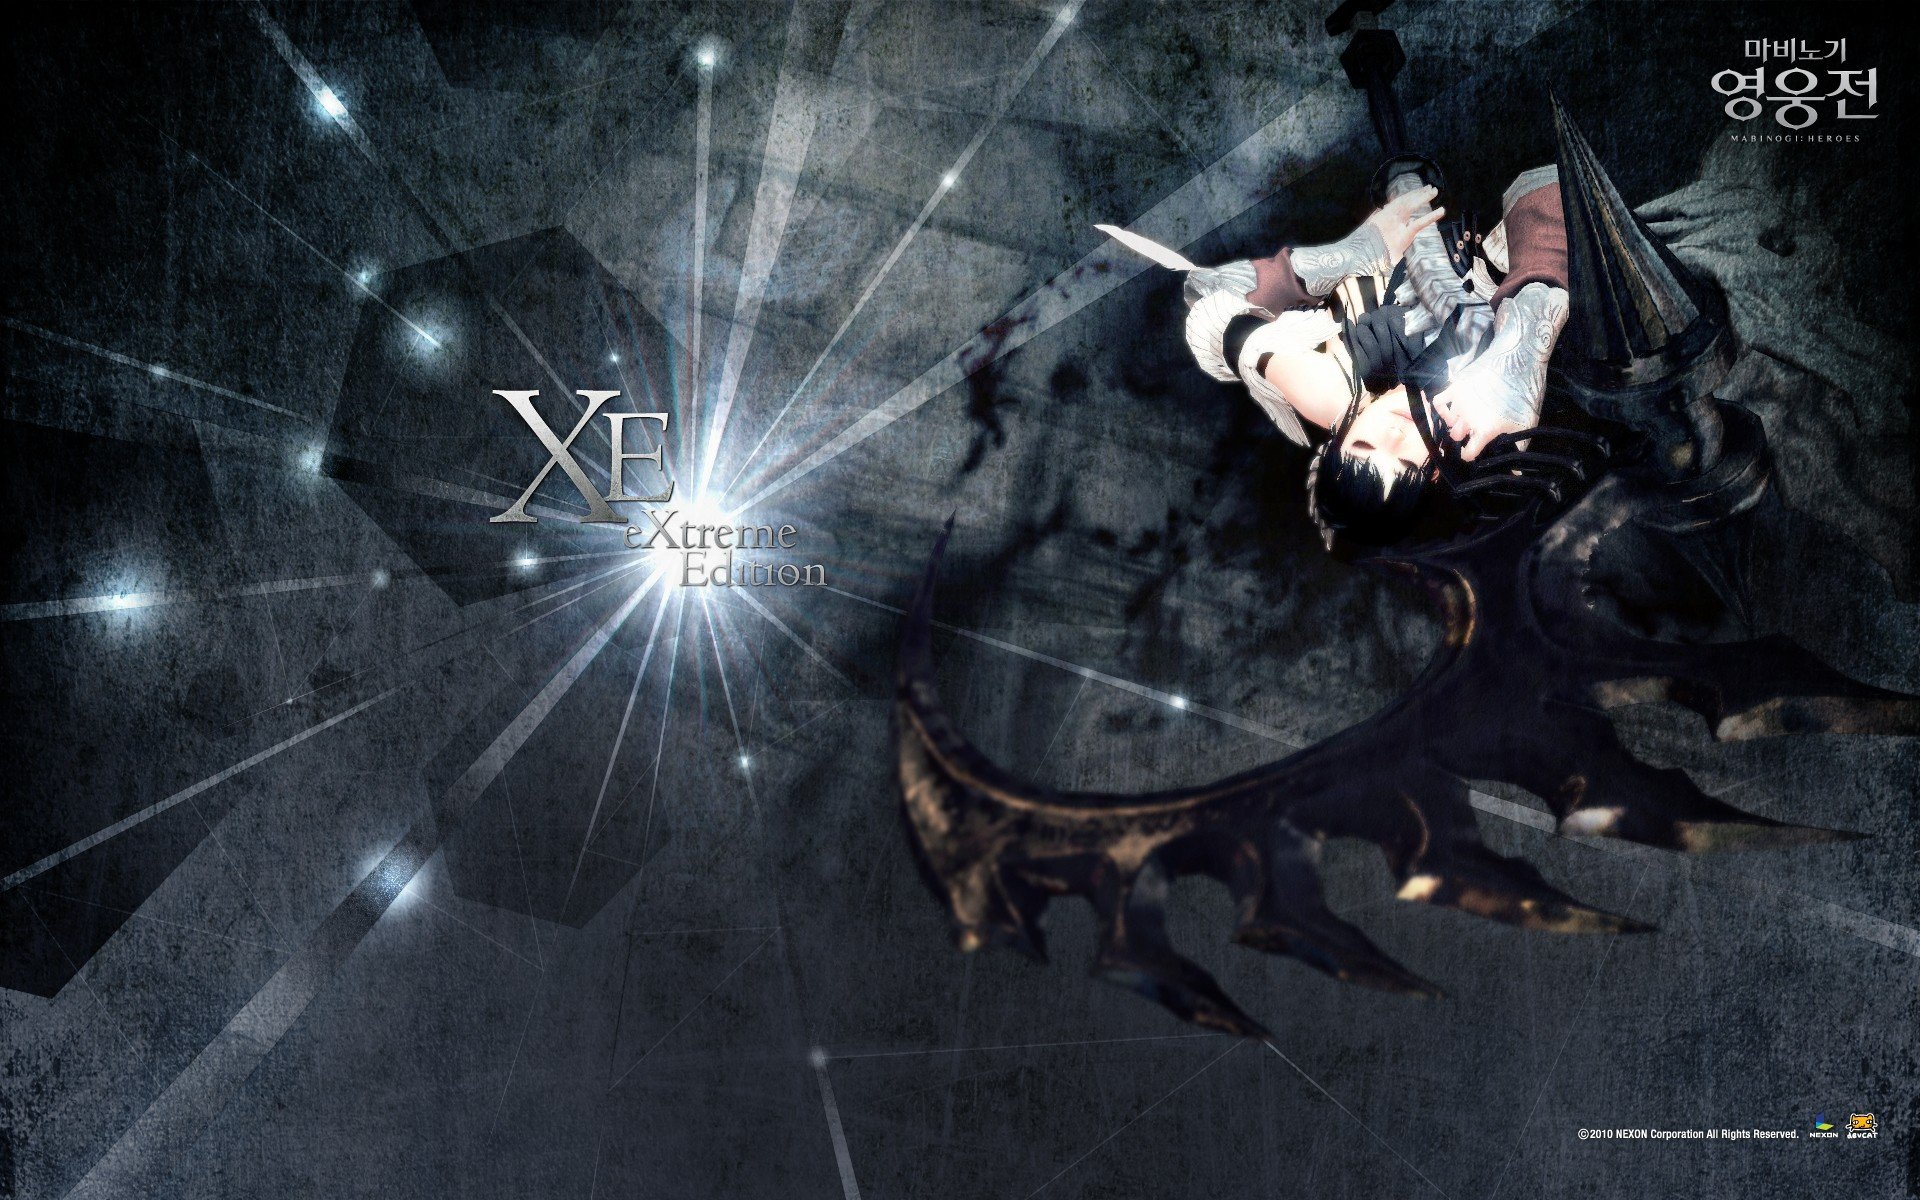 Scythe vindictus nexon games mabinogi heroes evie - Evie wallpaper ...